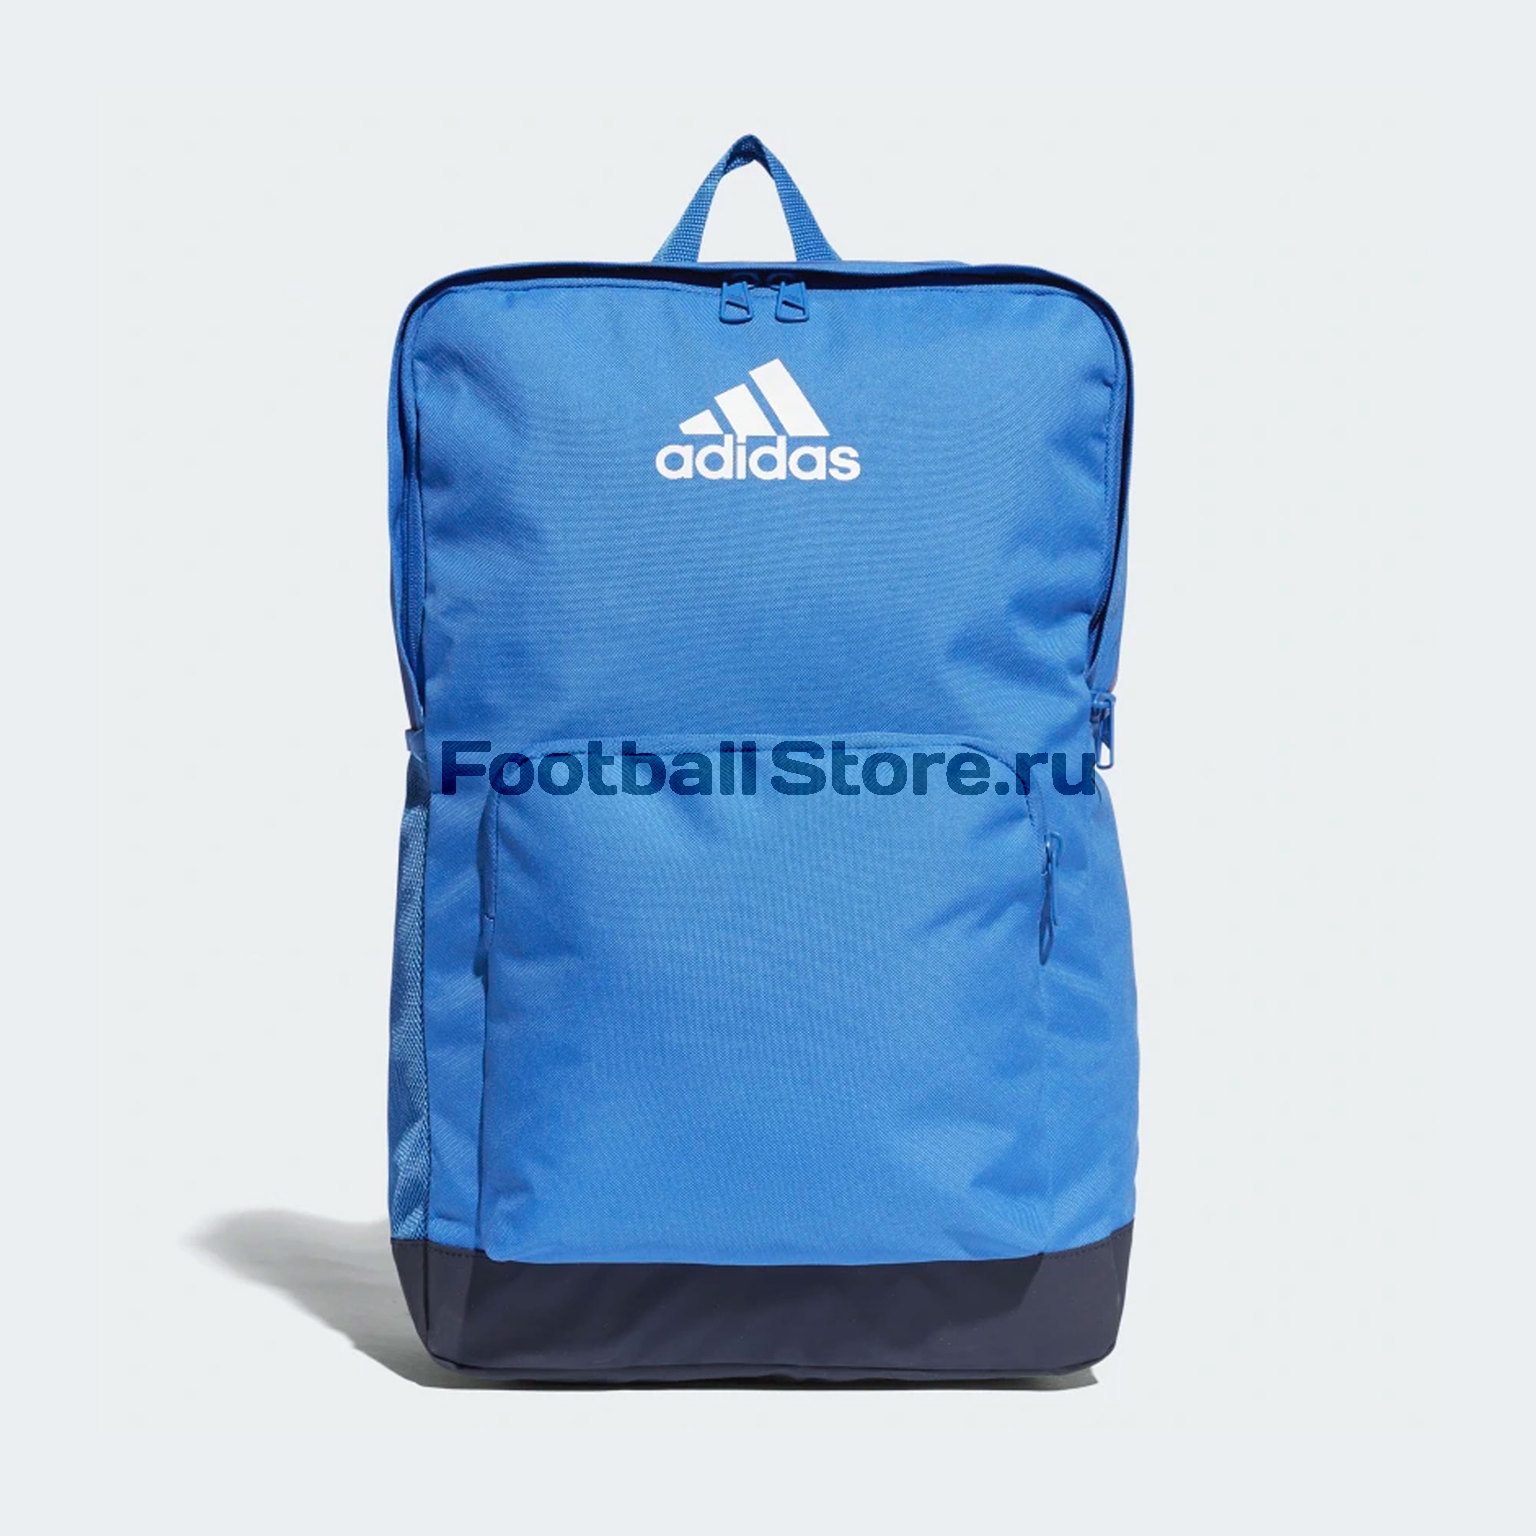 Рюкзак Adidas Tiro BP B46130 рюкзак adidas 2014 m67763